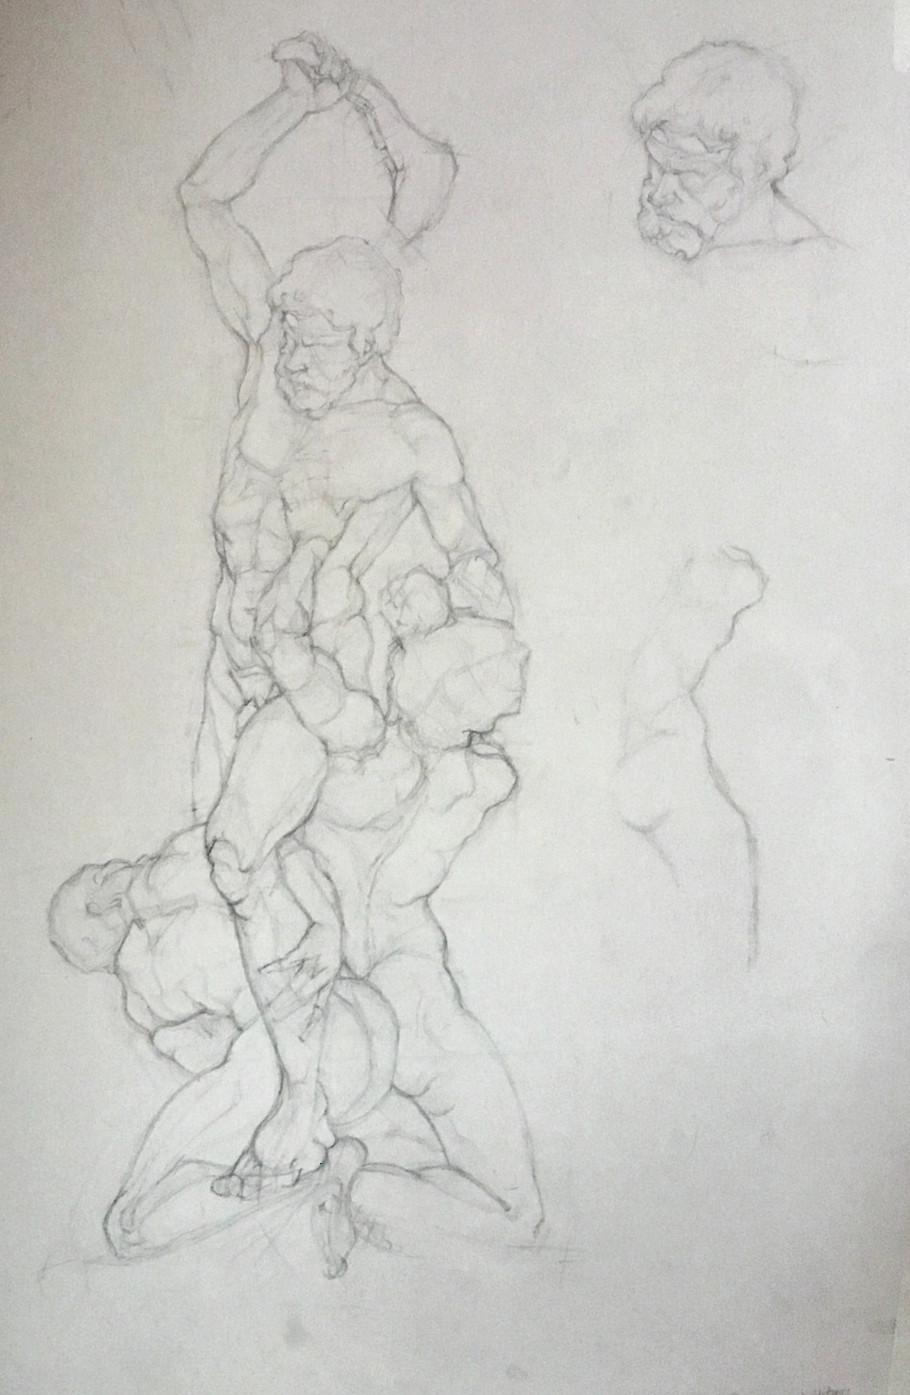 Pencil sketch of 'Samson and the Philistines' by Foggini